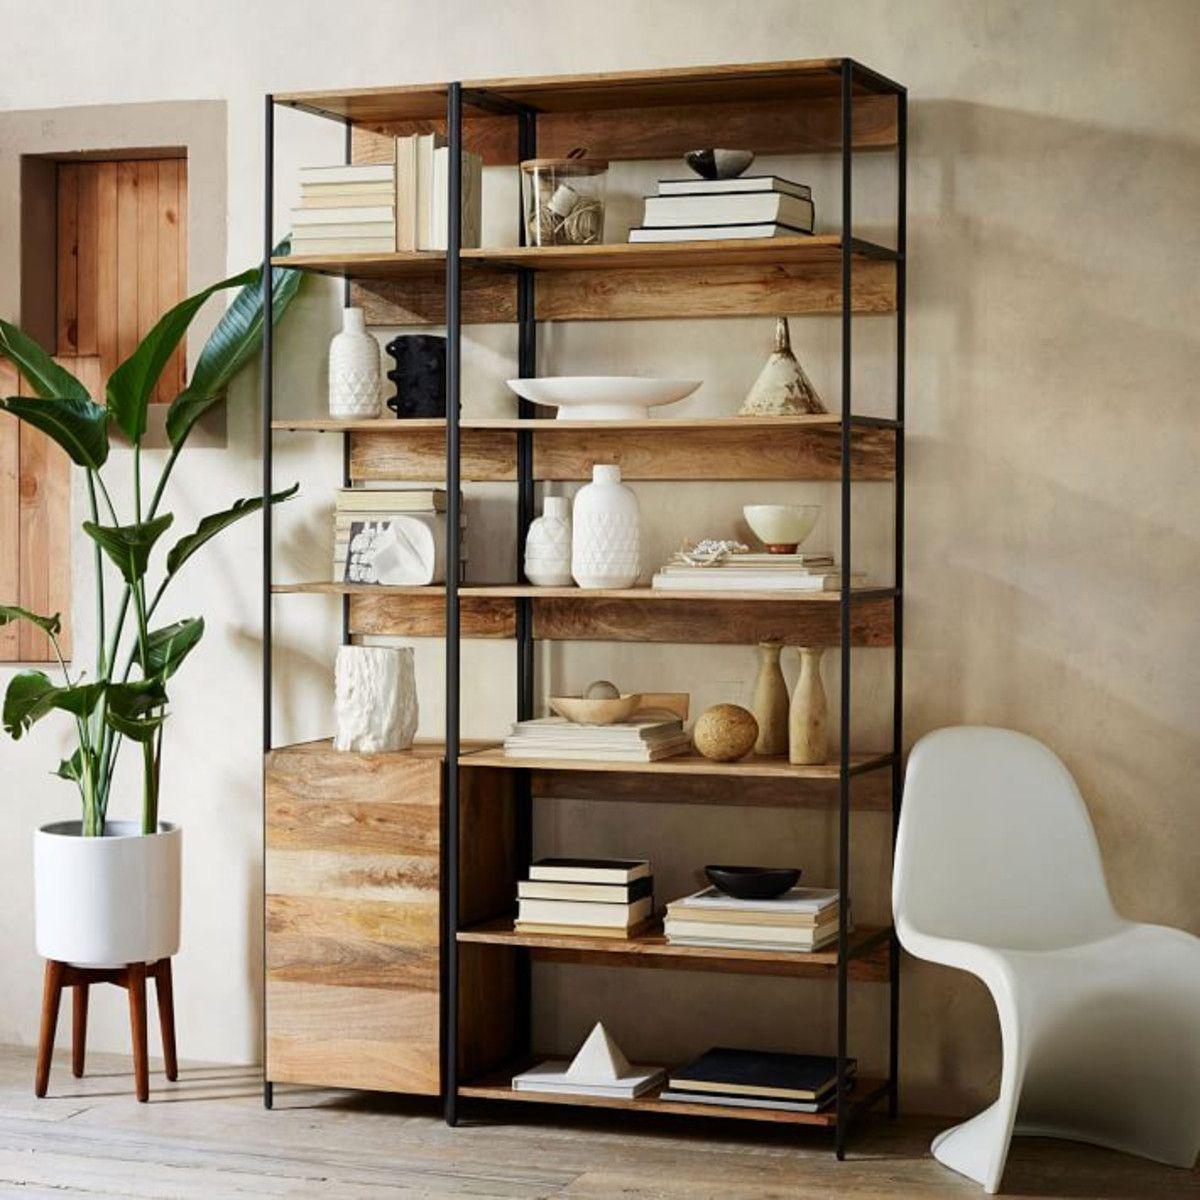 Industrial Modular 33 Bookshelf West Elm Ca Living Room Diy Living Room Shelves Living Room Storage